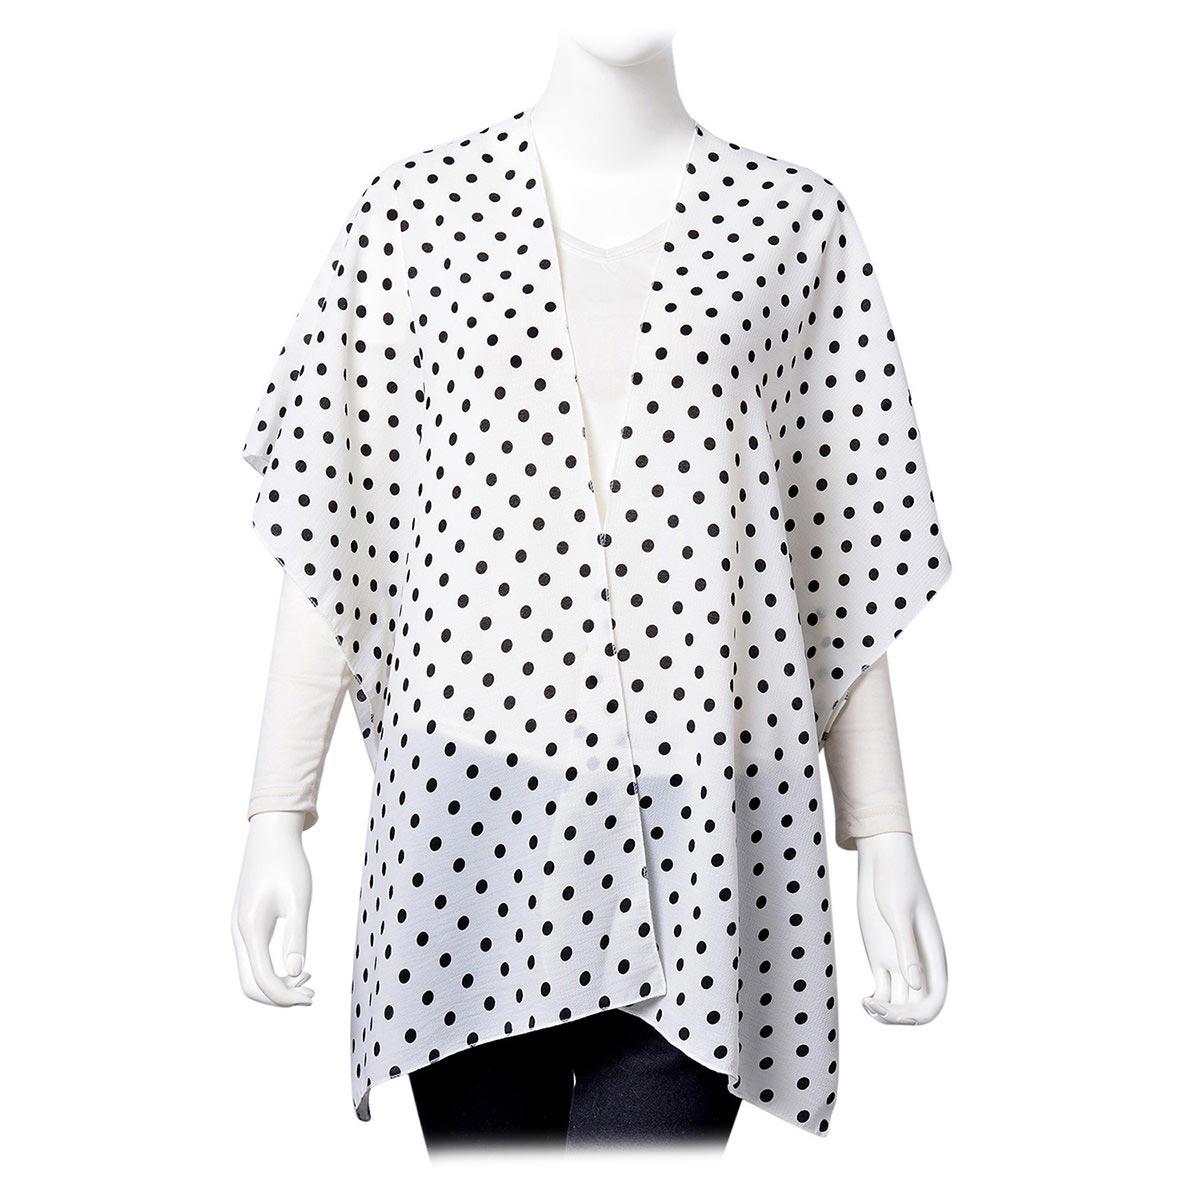 White with Black Dot Pattern 100% Polyester Kimono (28.35x36.22 in)